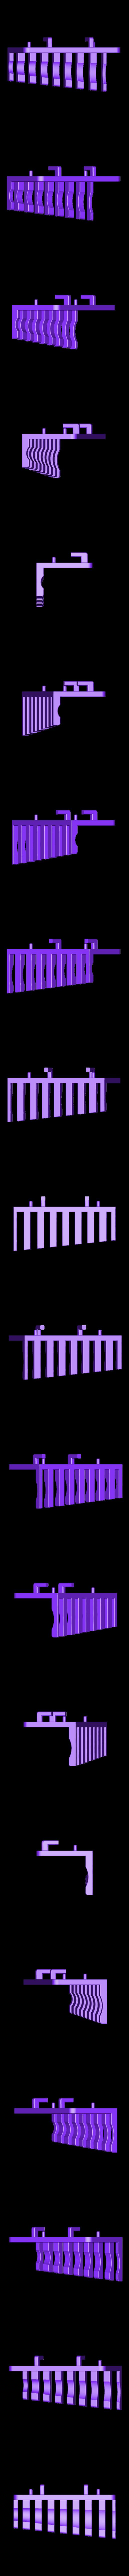 011_ikea_pegboard.stl Download free STL file Combination Spanner Set 8pcs metric 8-19mm Wall Holder 011 I for screws or peg board • 3D printer model, Wiesemann1893